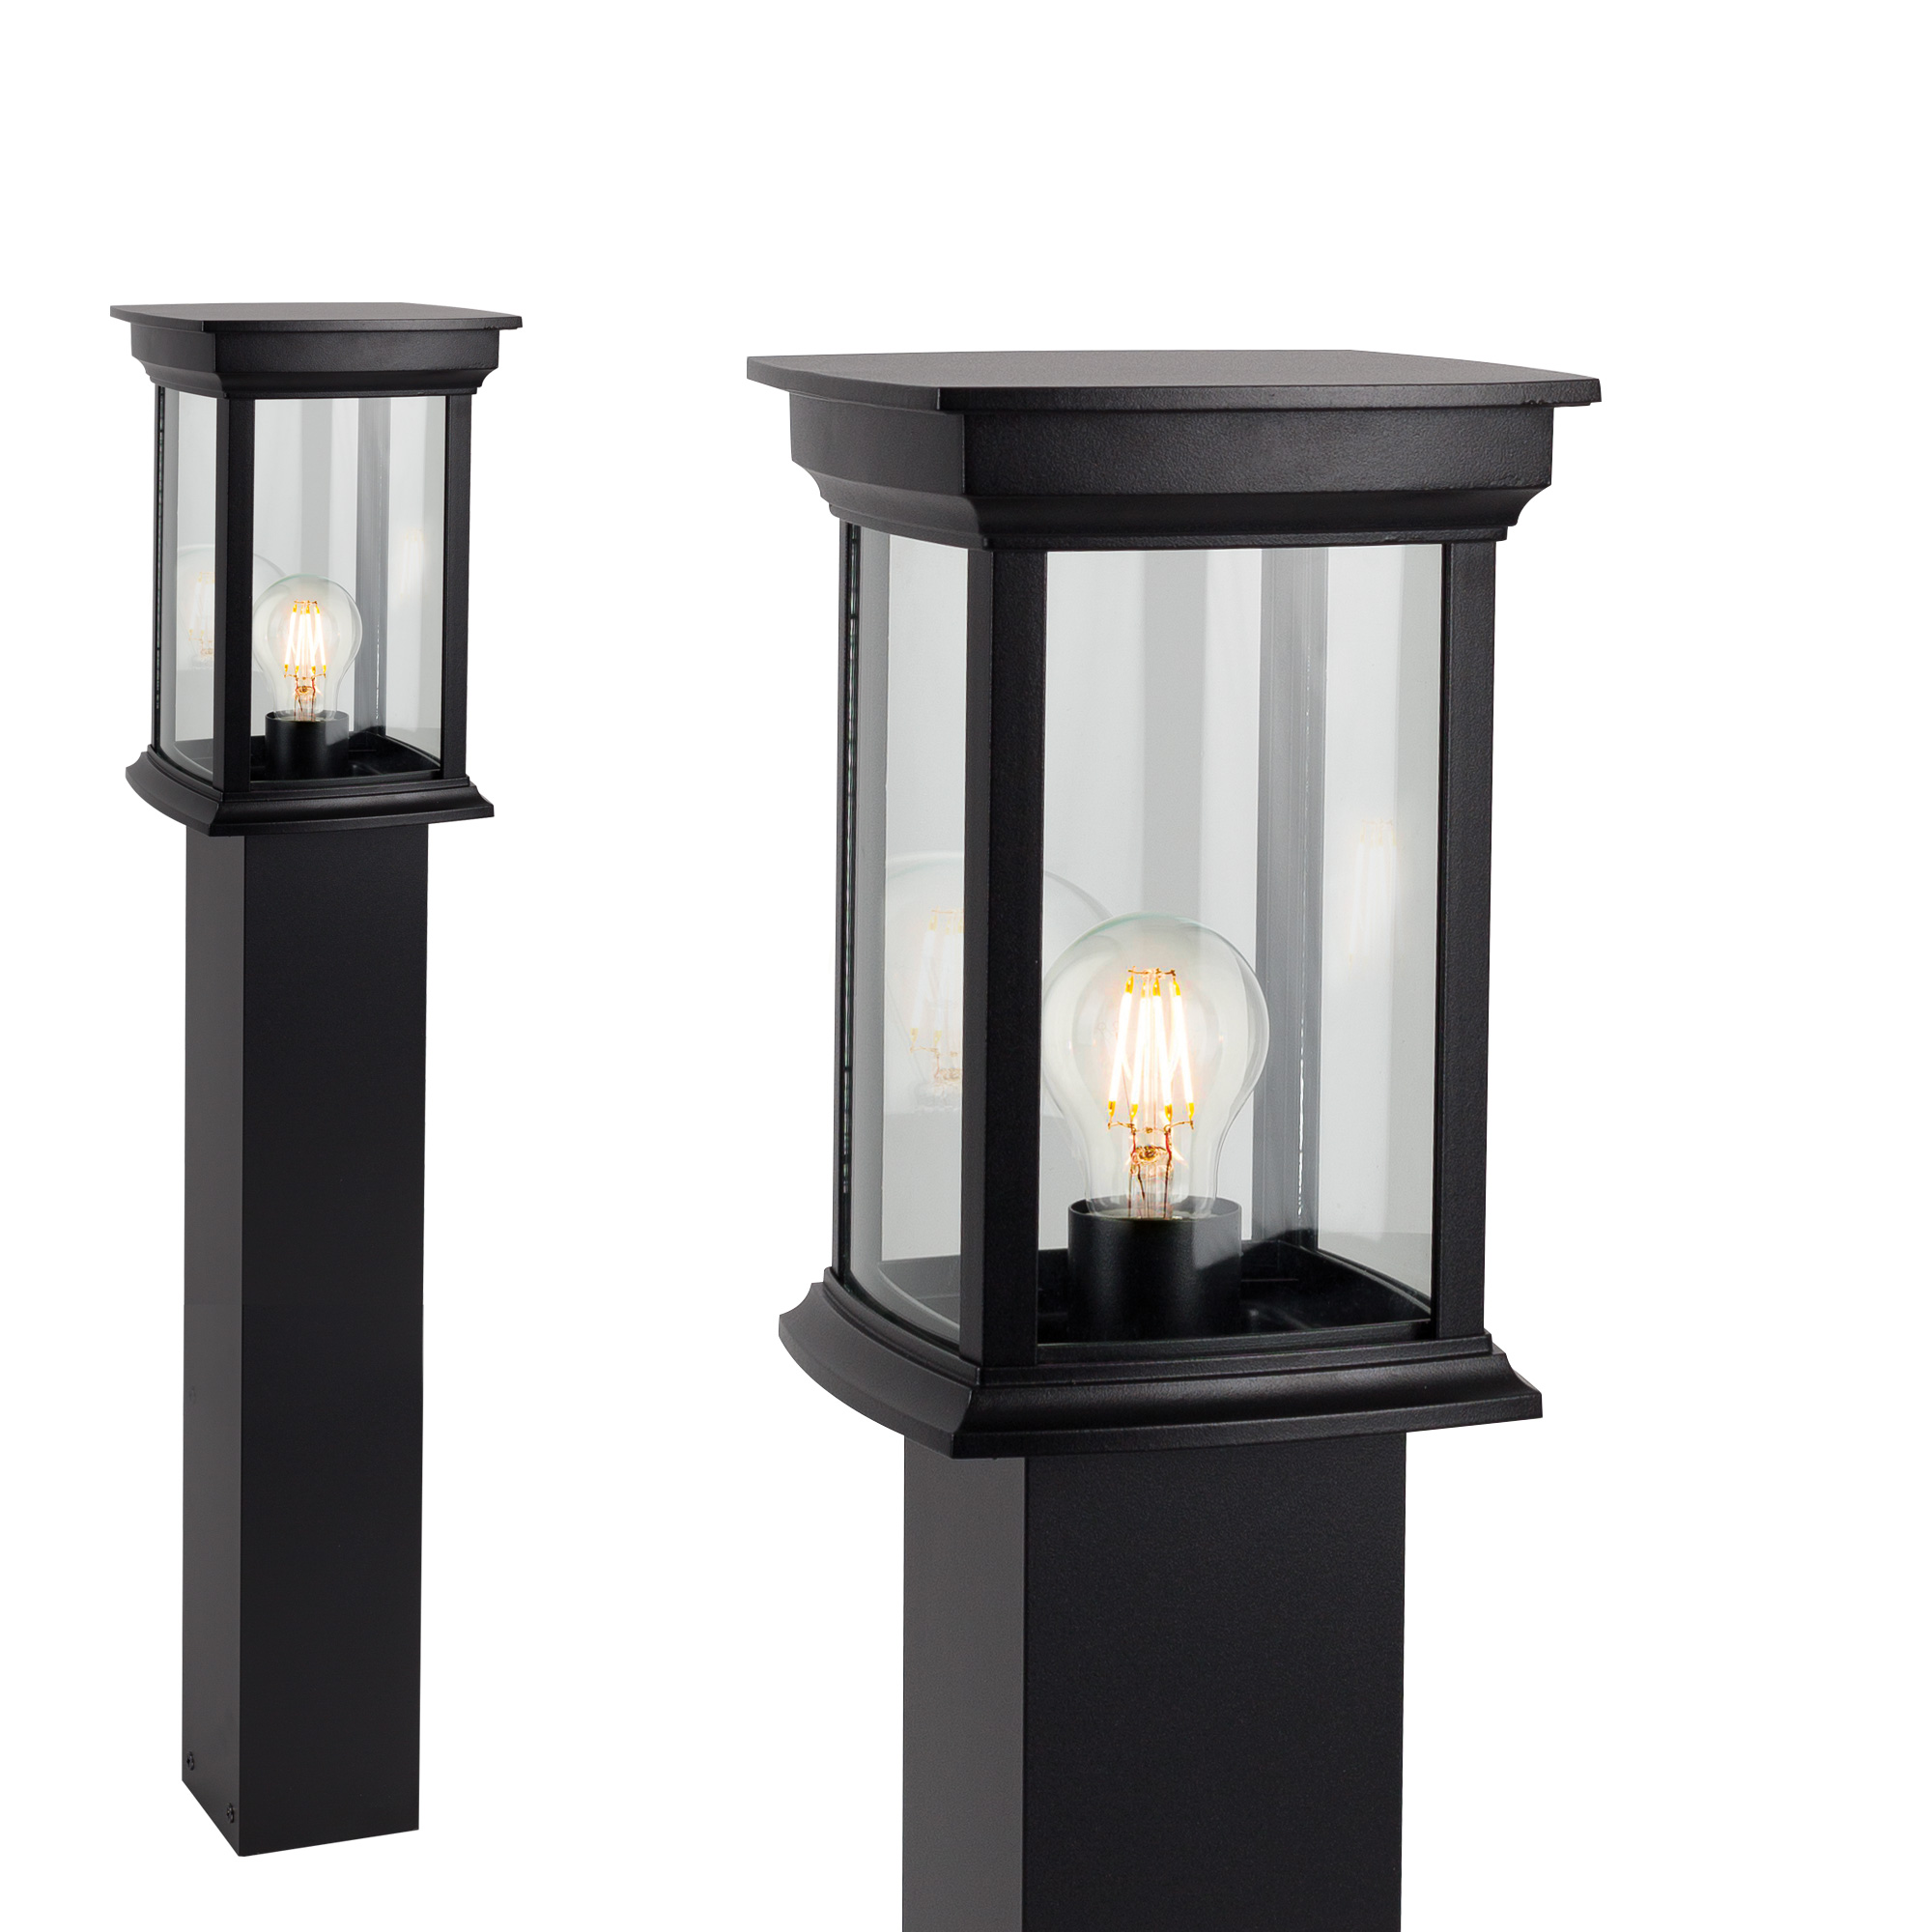 Buitenlamp Staand Zwart Carlton Terras